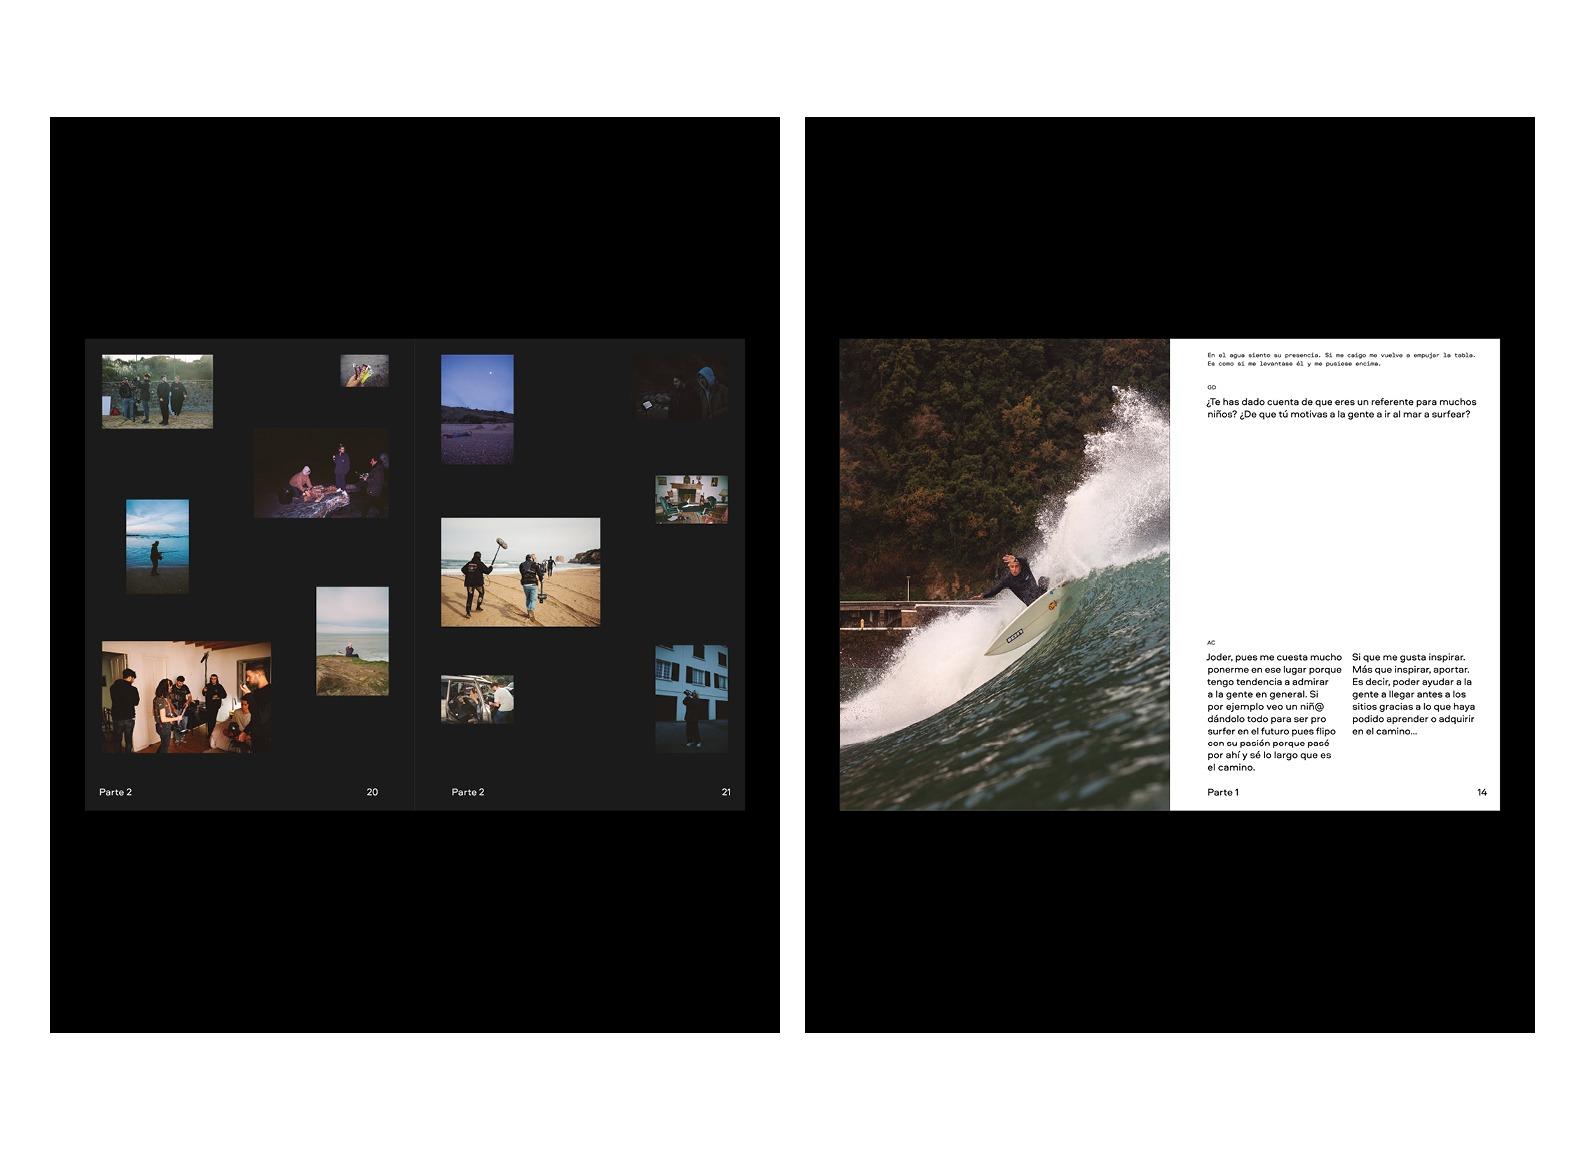 soundofsurfing-bruma19